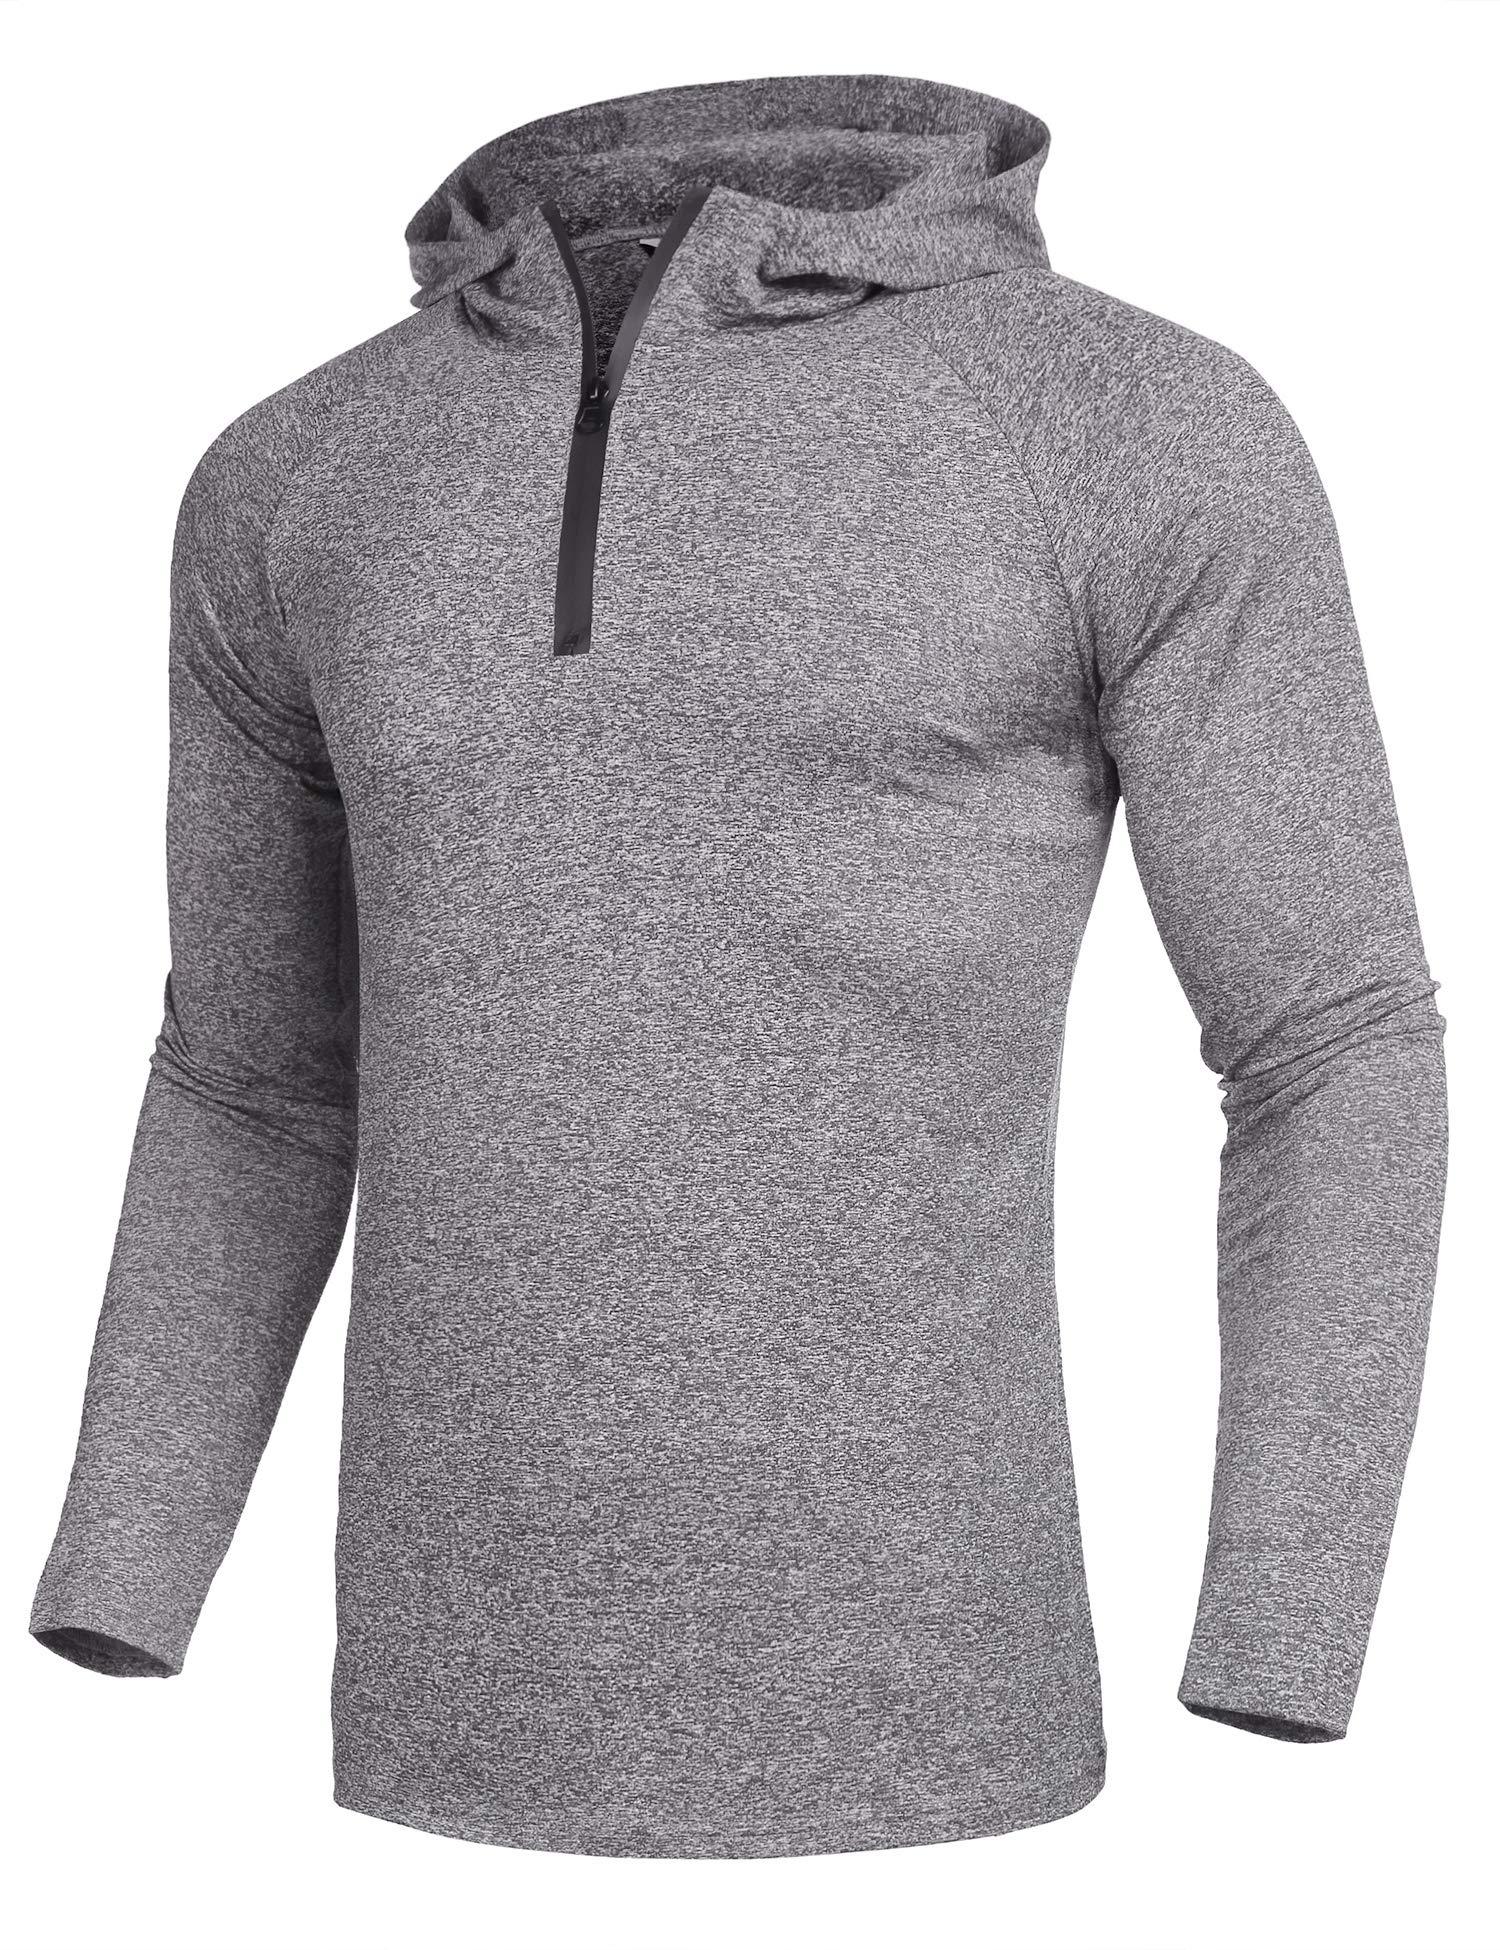 COOFANDY Men's Active Quarter Zip Hoodies Training Athletic Pullover Shirt by COOFANDY